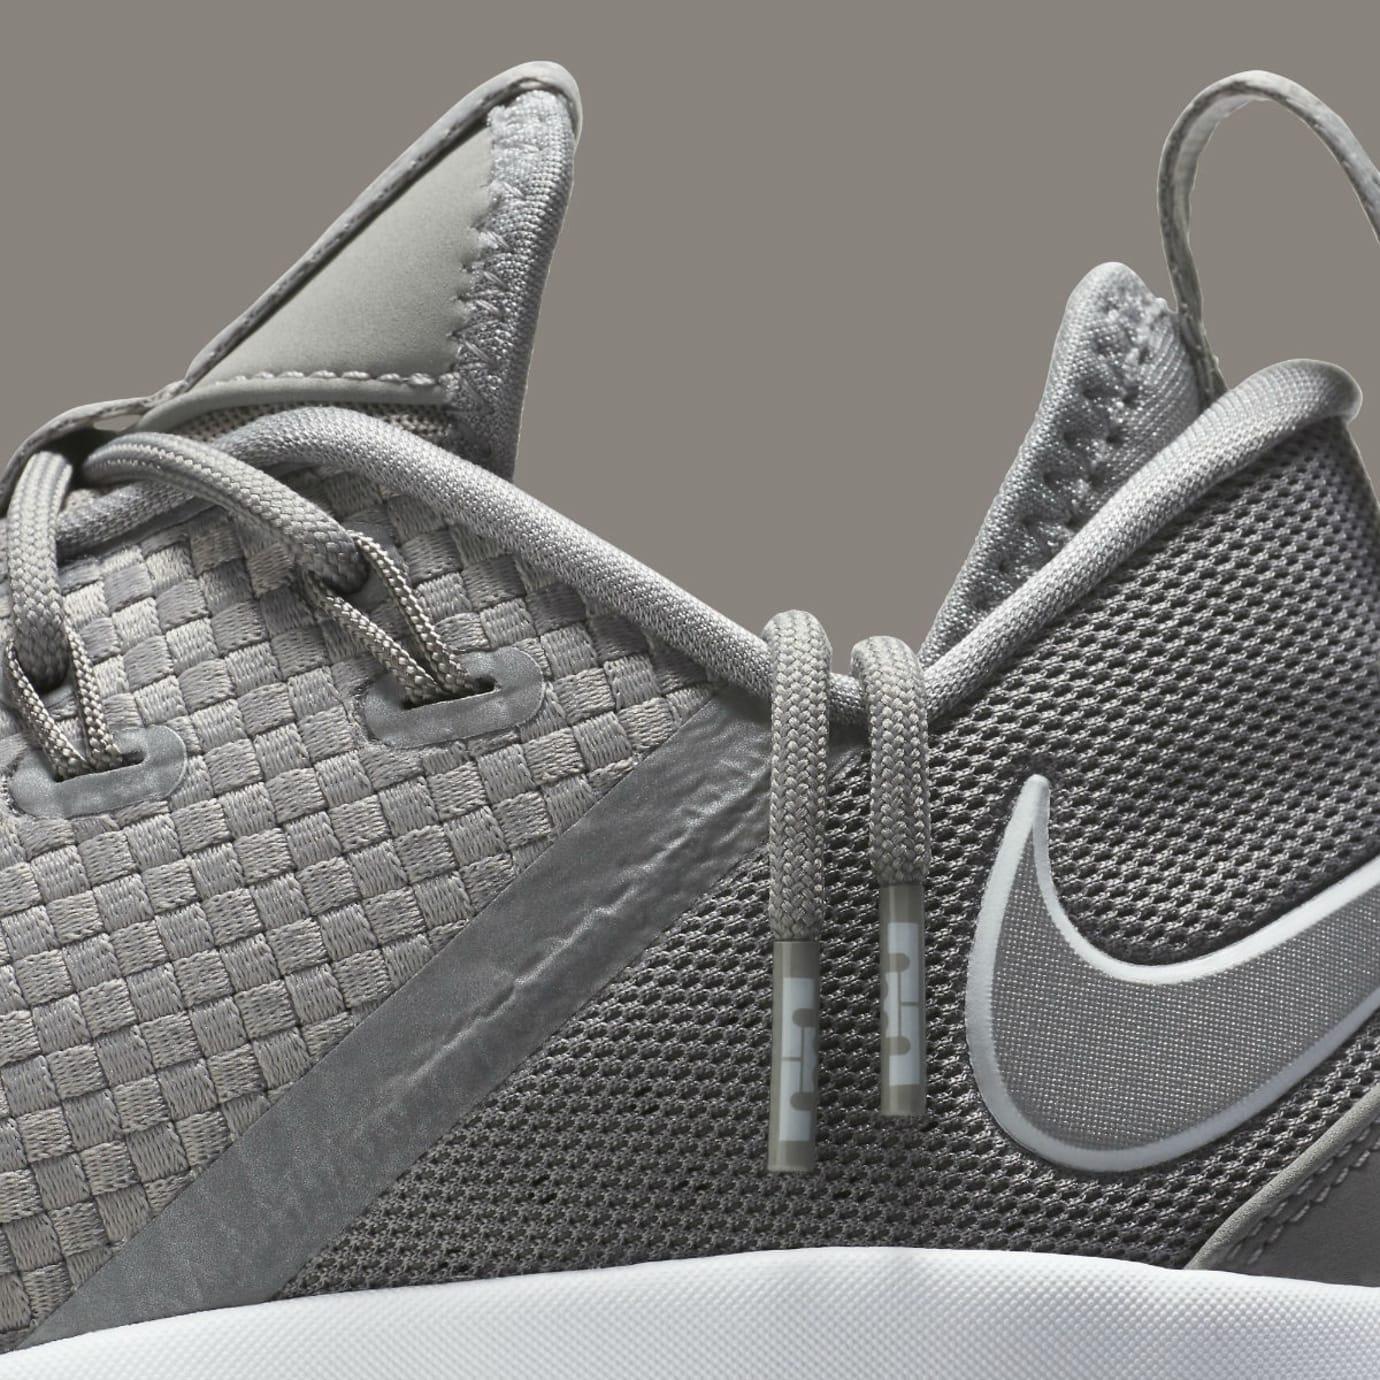 Nike LeBron 14 Low Dunkman Release Date Laces 878636-005